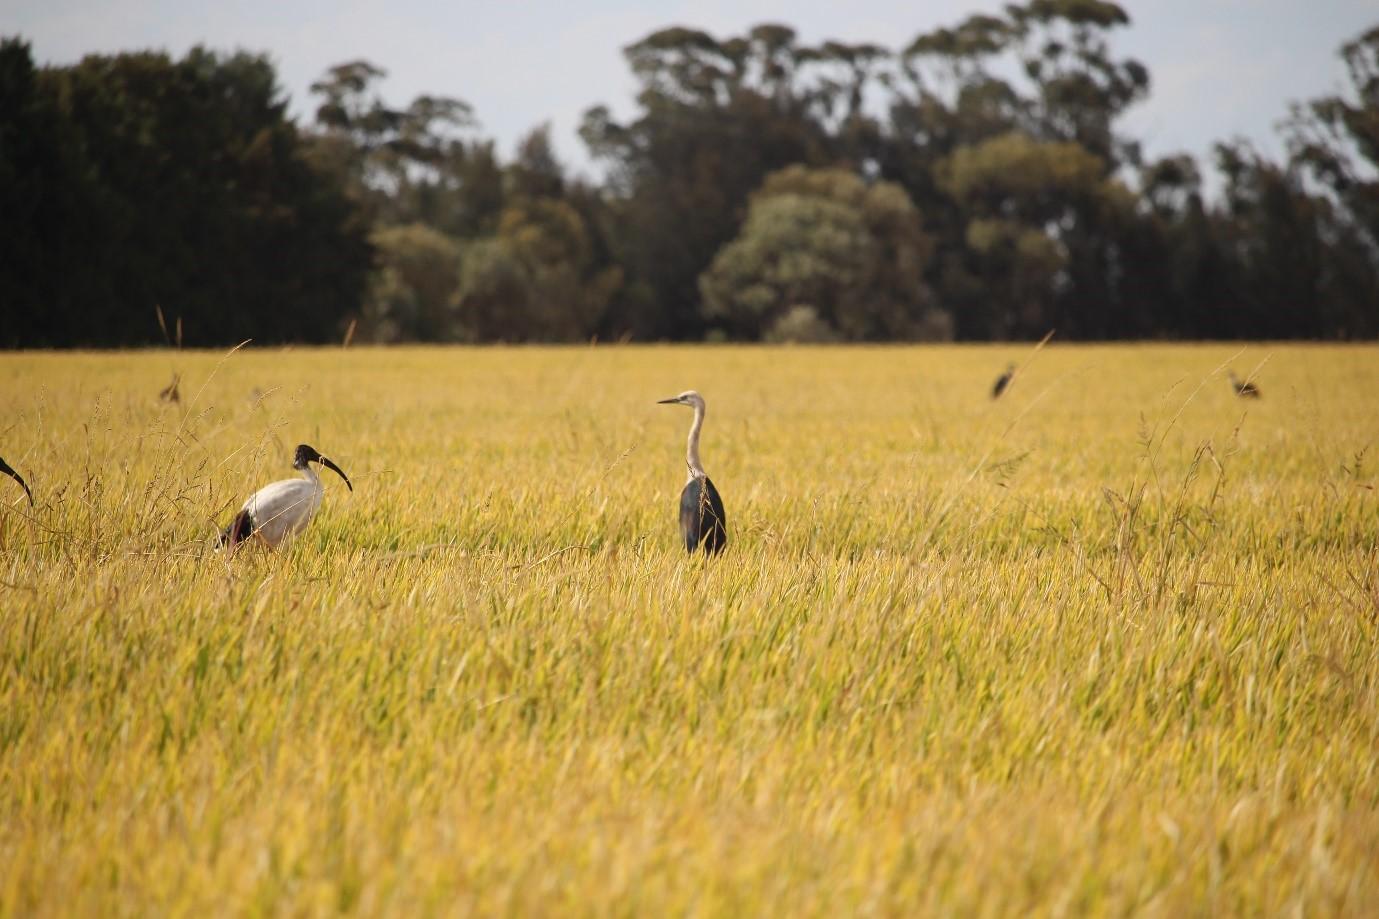 Birds in crop.jpg